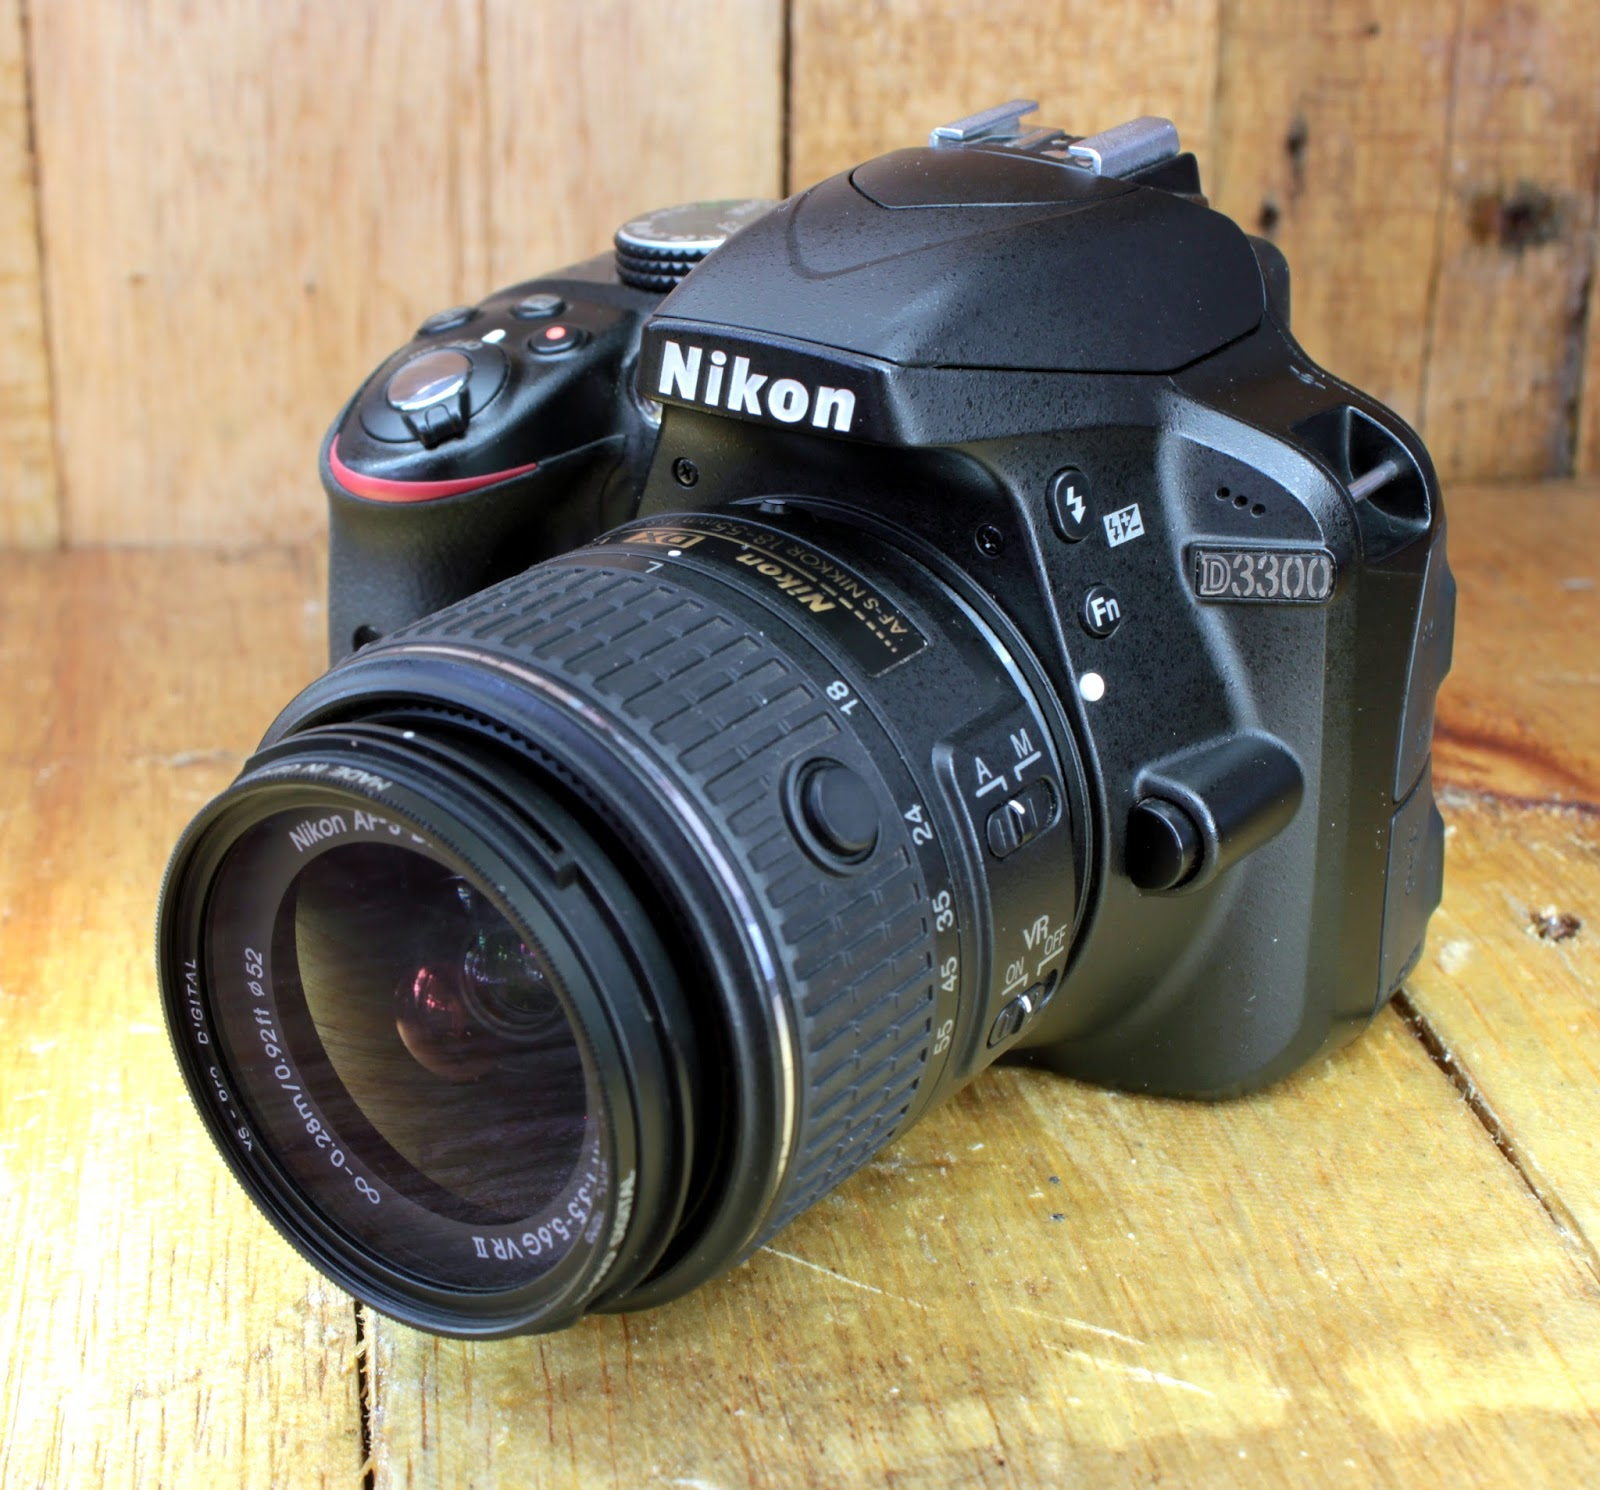 Jual Kamera Bekas Nikon D3300 Di Malang Jual Beli Laptop Bekas